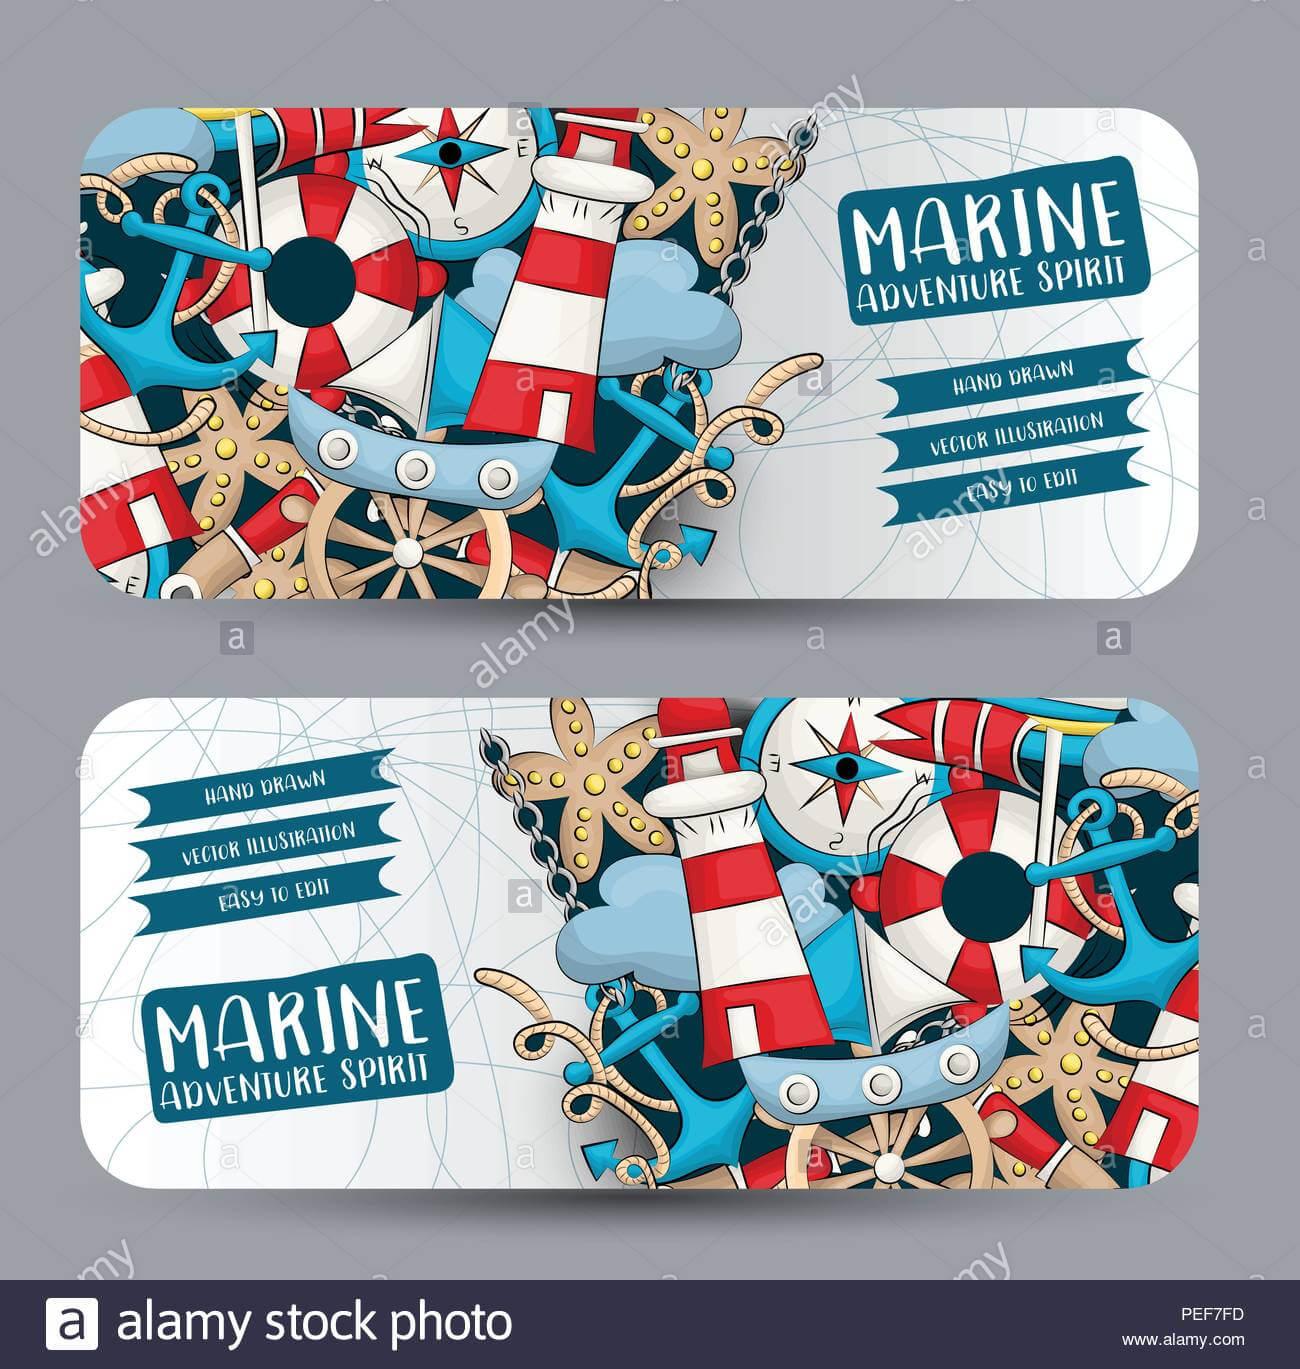 Marine Nautical Travel Concept. Horizontal Banner Template Pertaining To Nautical Banner Template